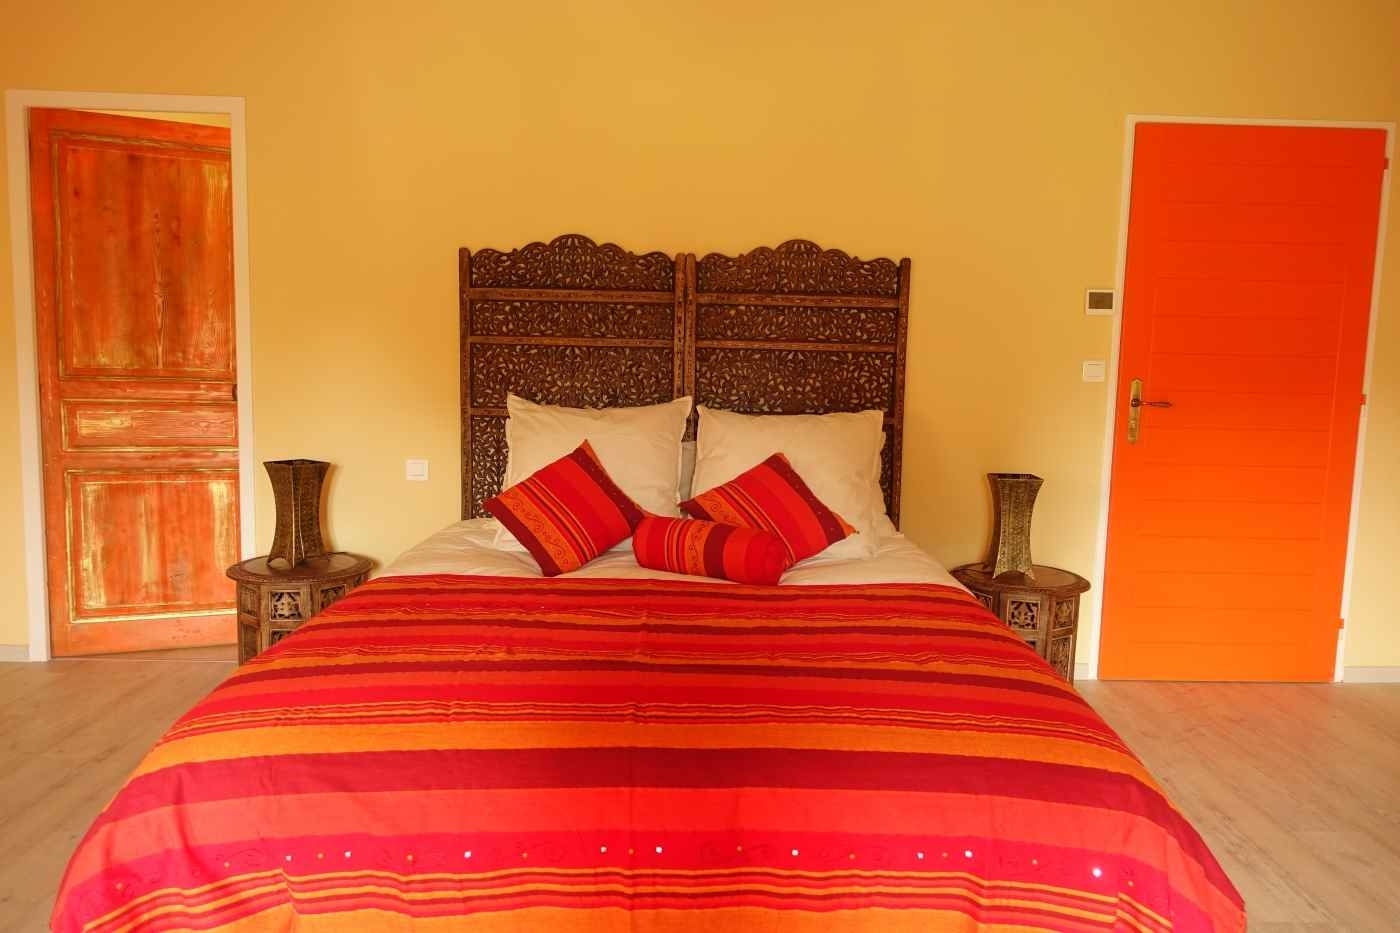 chambre safran chambre d 39 h tes cologique de charme albi. Black Bedroom Furniture Sets. Home Design Ideas